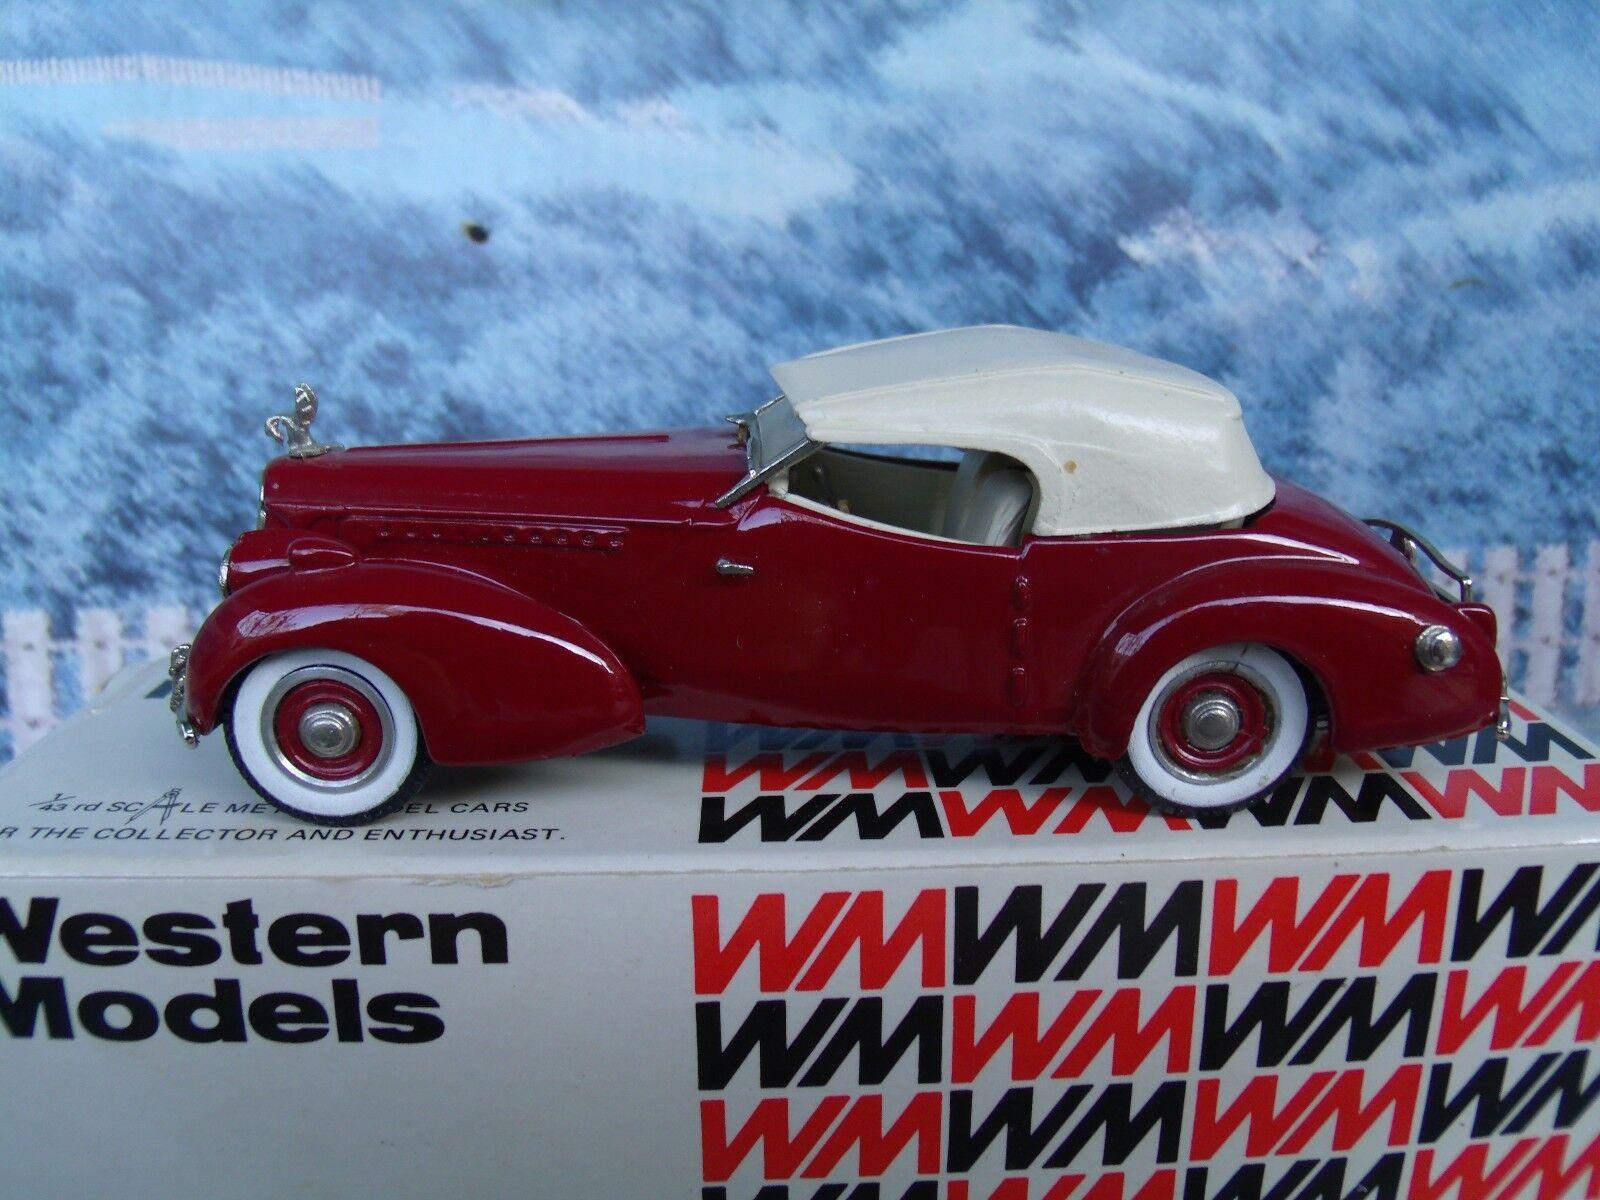 1/43 Western Modelos (Inglaterra) 2018 Packard Darrin Super 8 Victoria